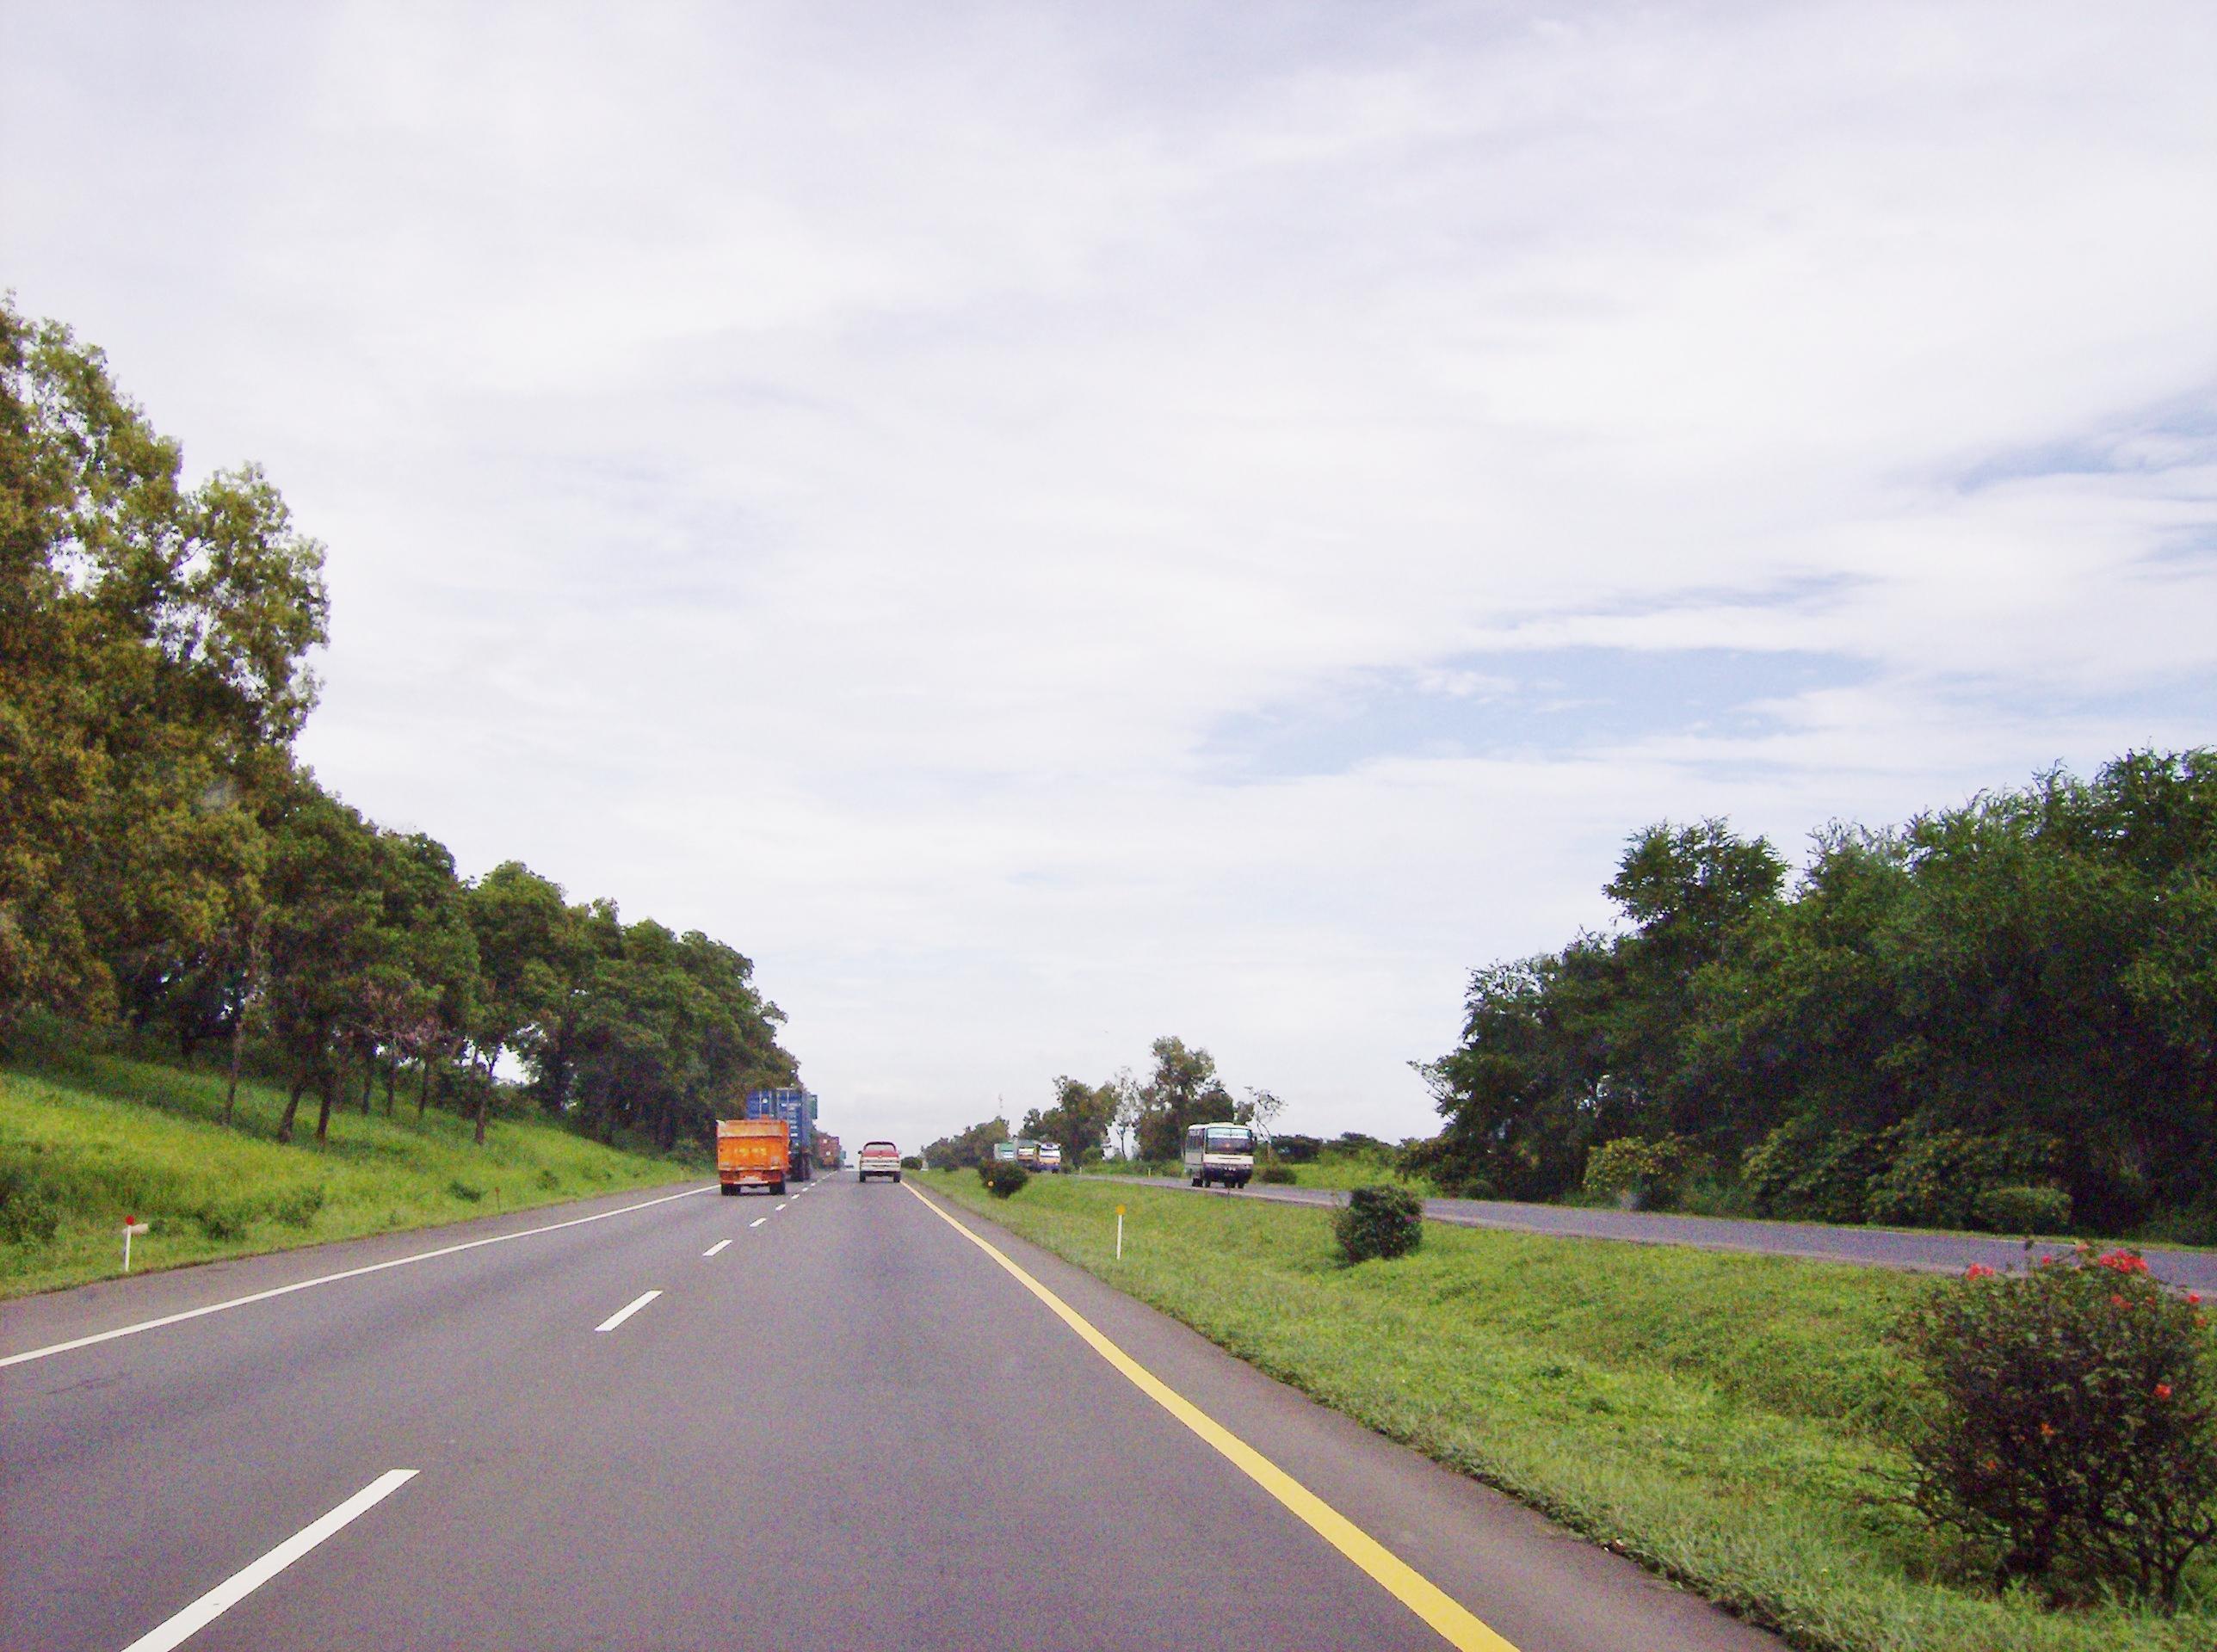 File:Jalan Tol Cikampek-Jakarta.jpg - Wikimedia Commons